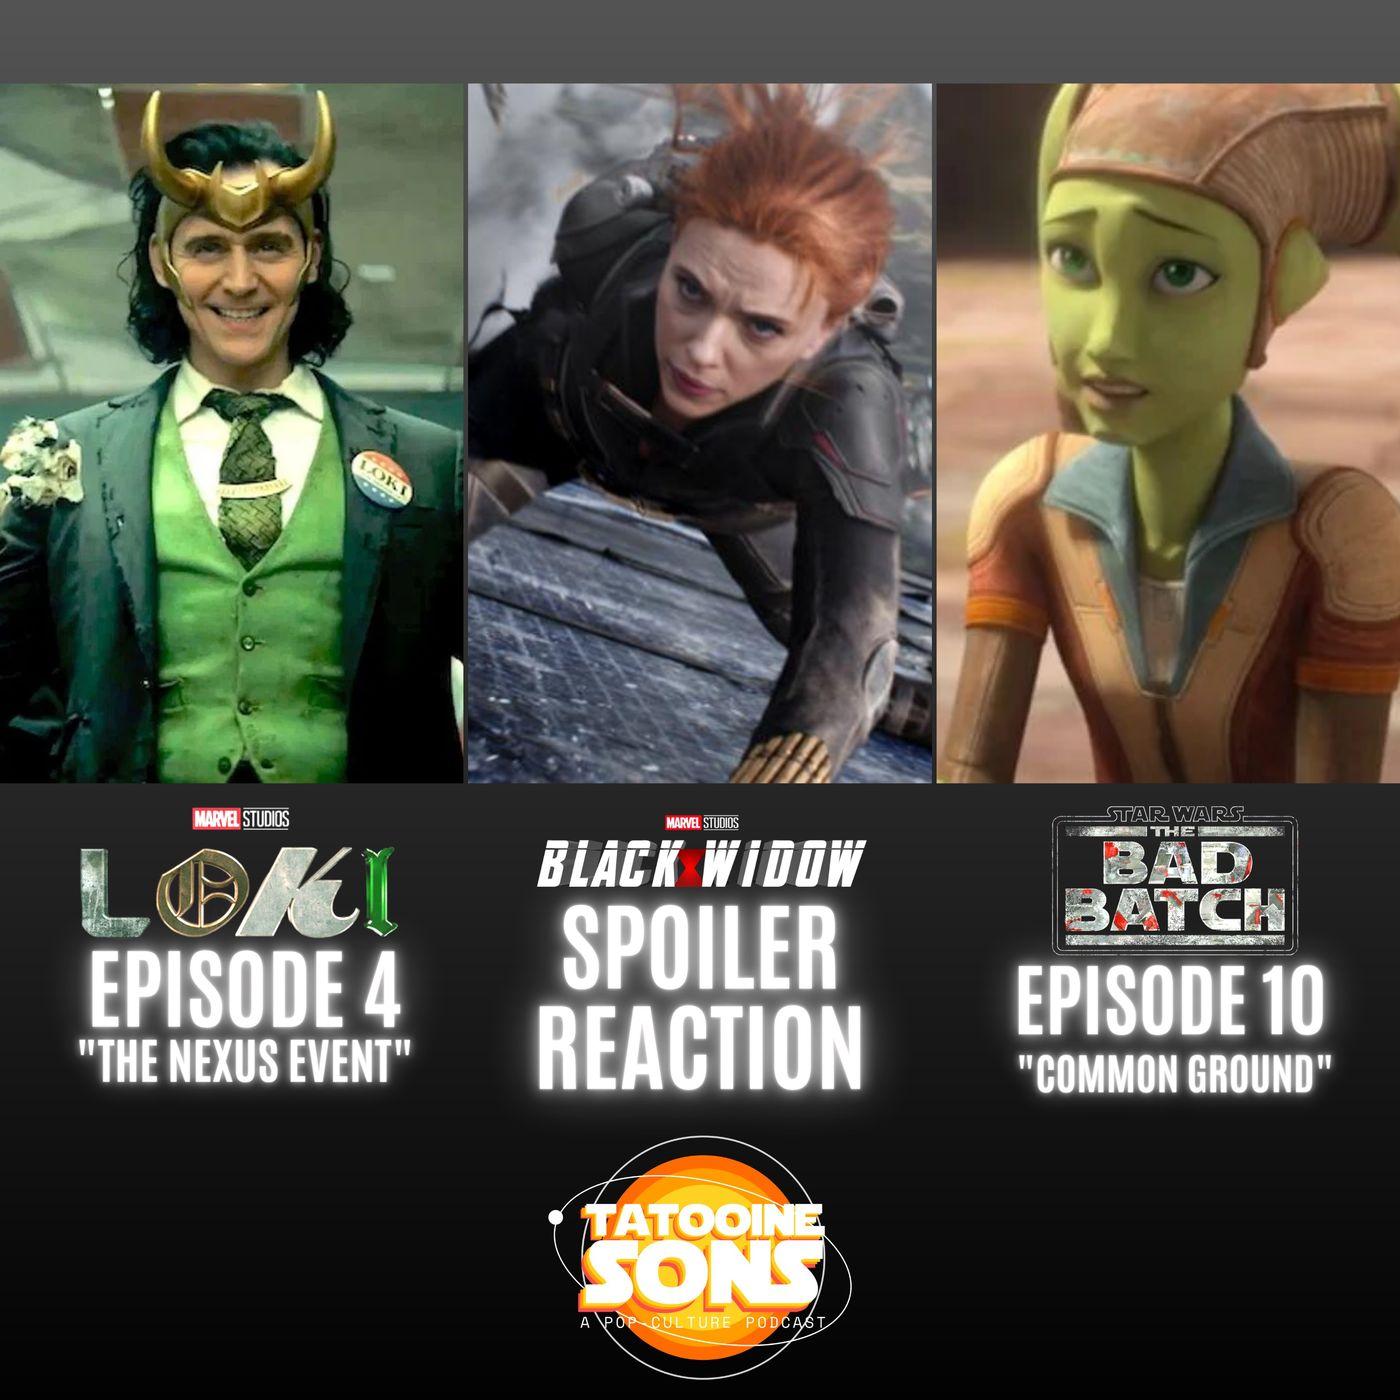 Black WIdow Spoiler Reaction! PLUS Loki and The Bad Batch